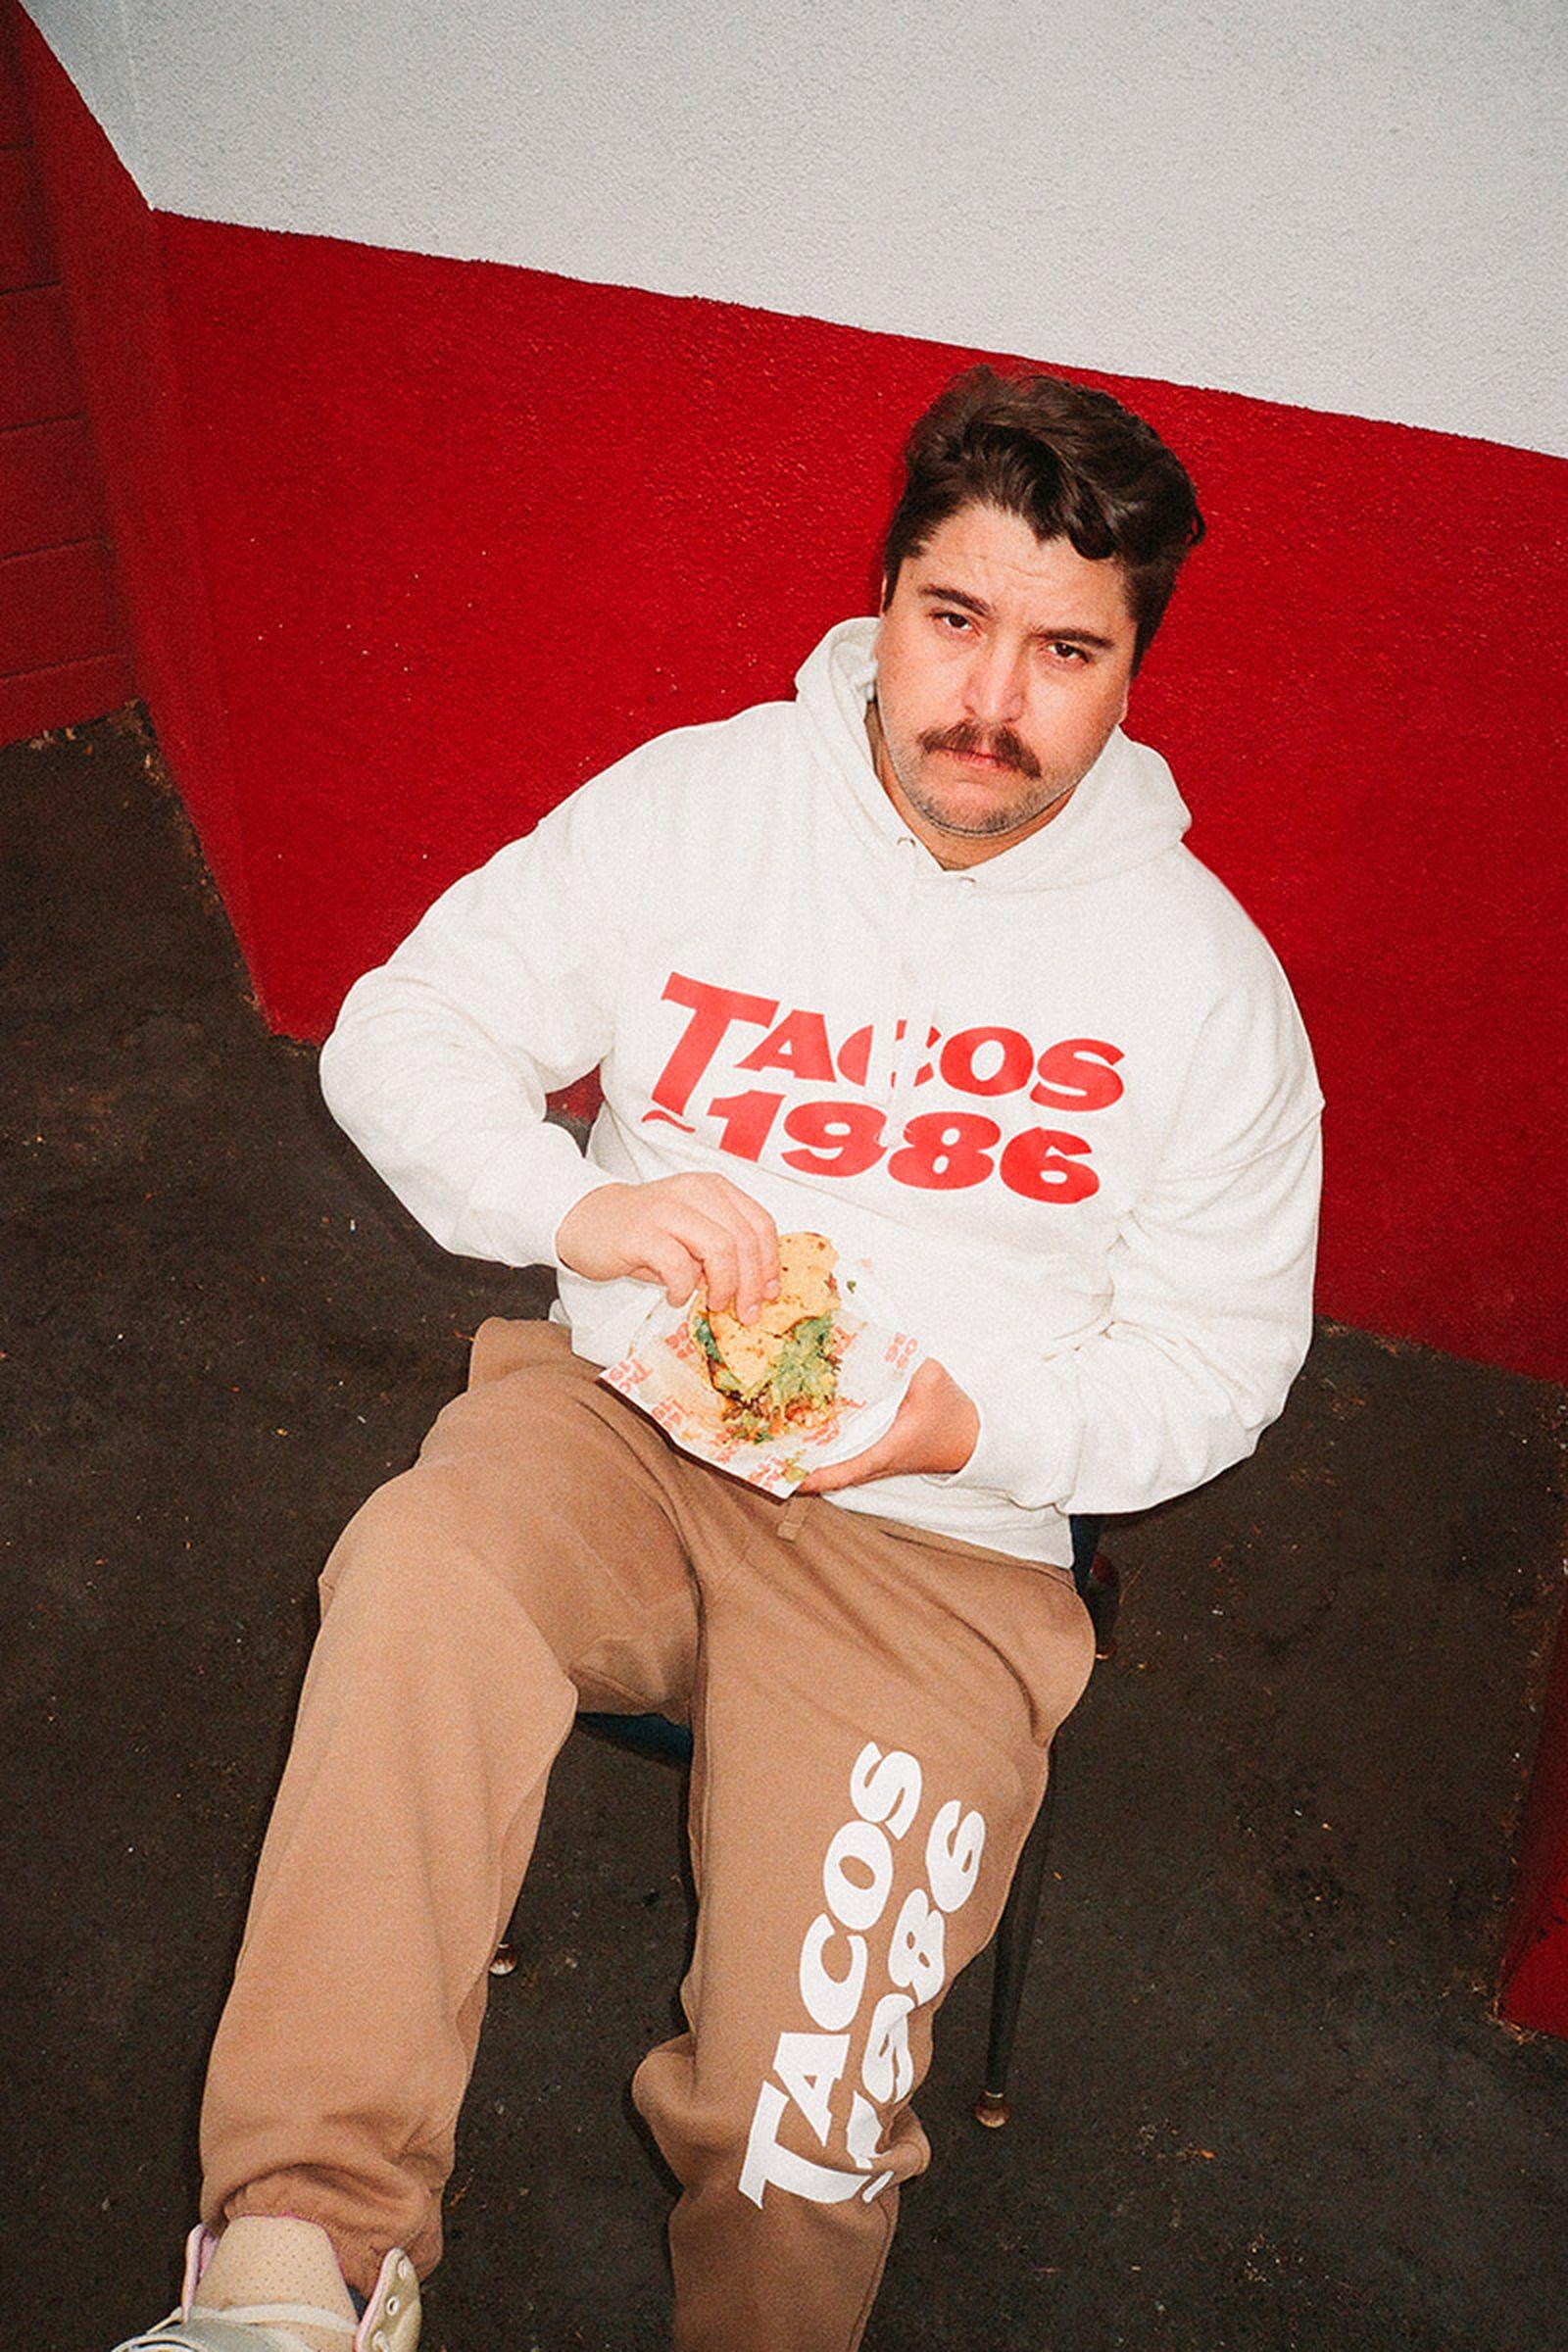 tacos-1986-x-hm-blank-staples-04